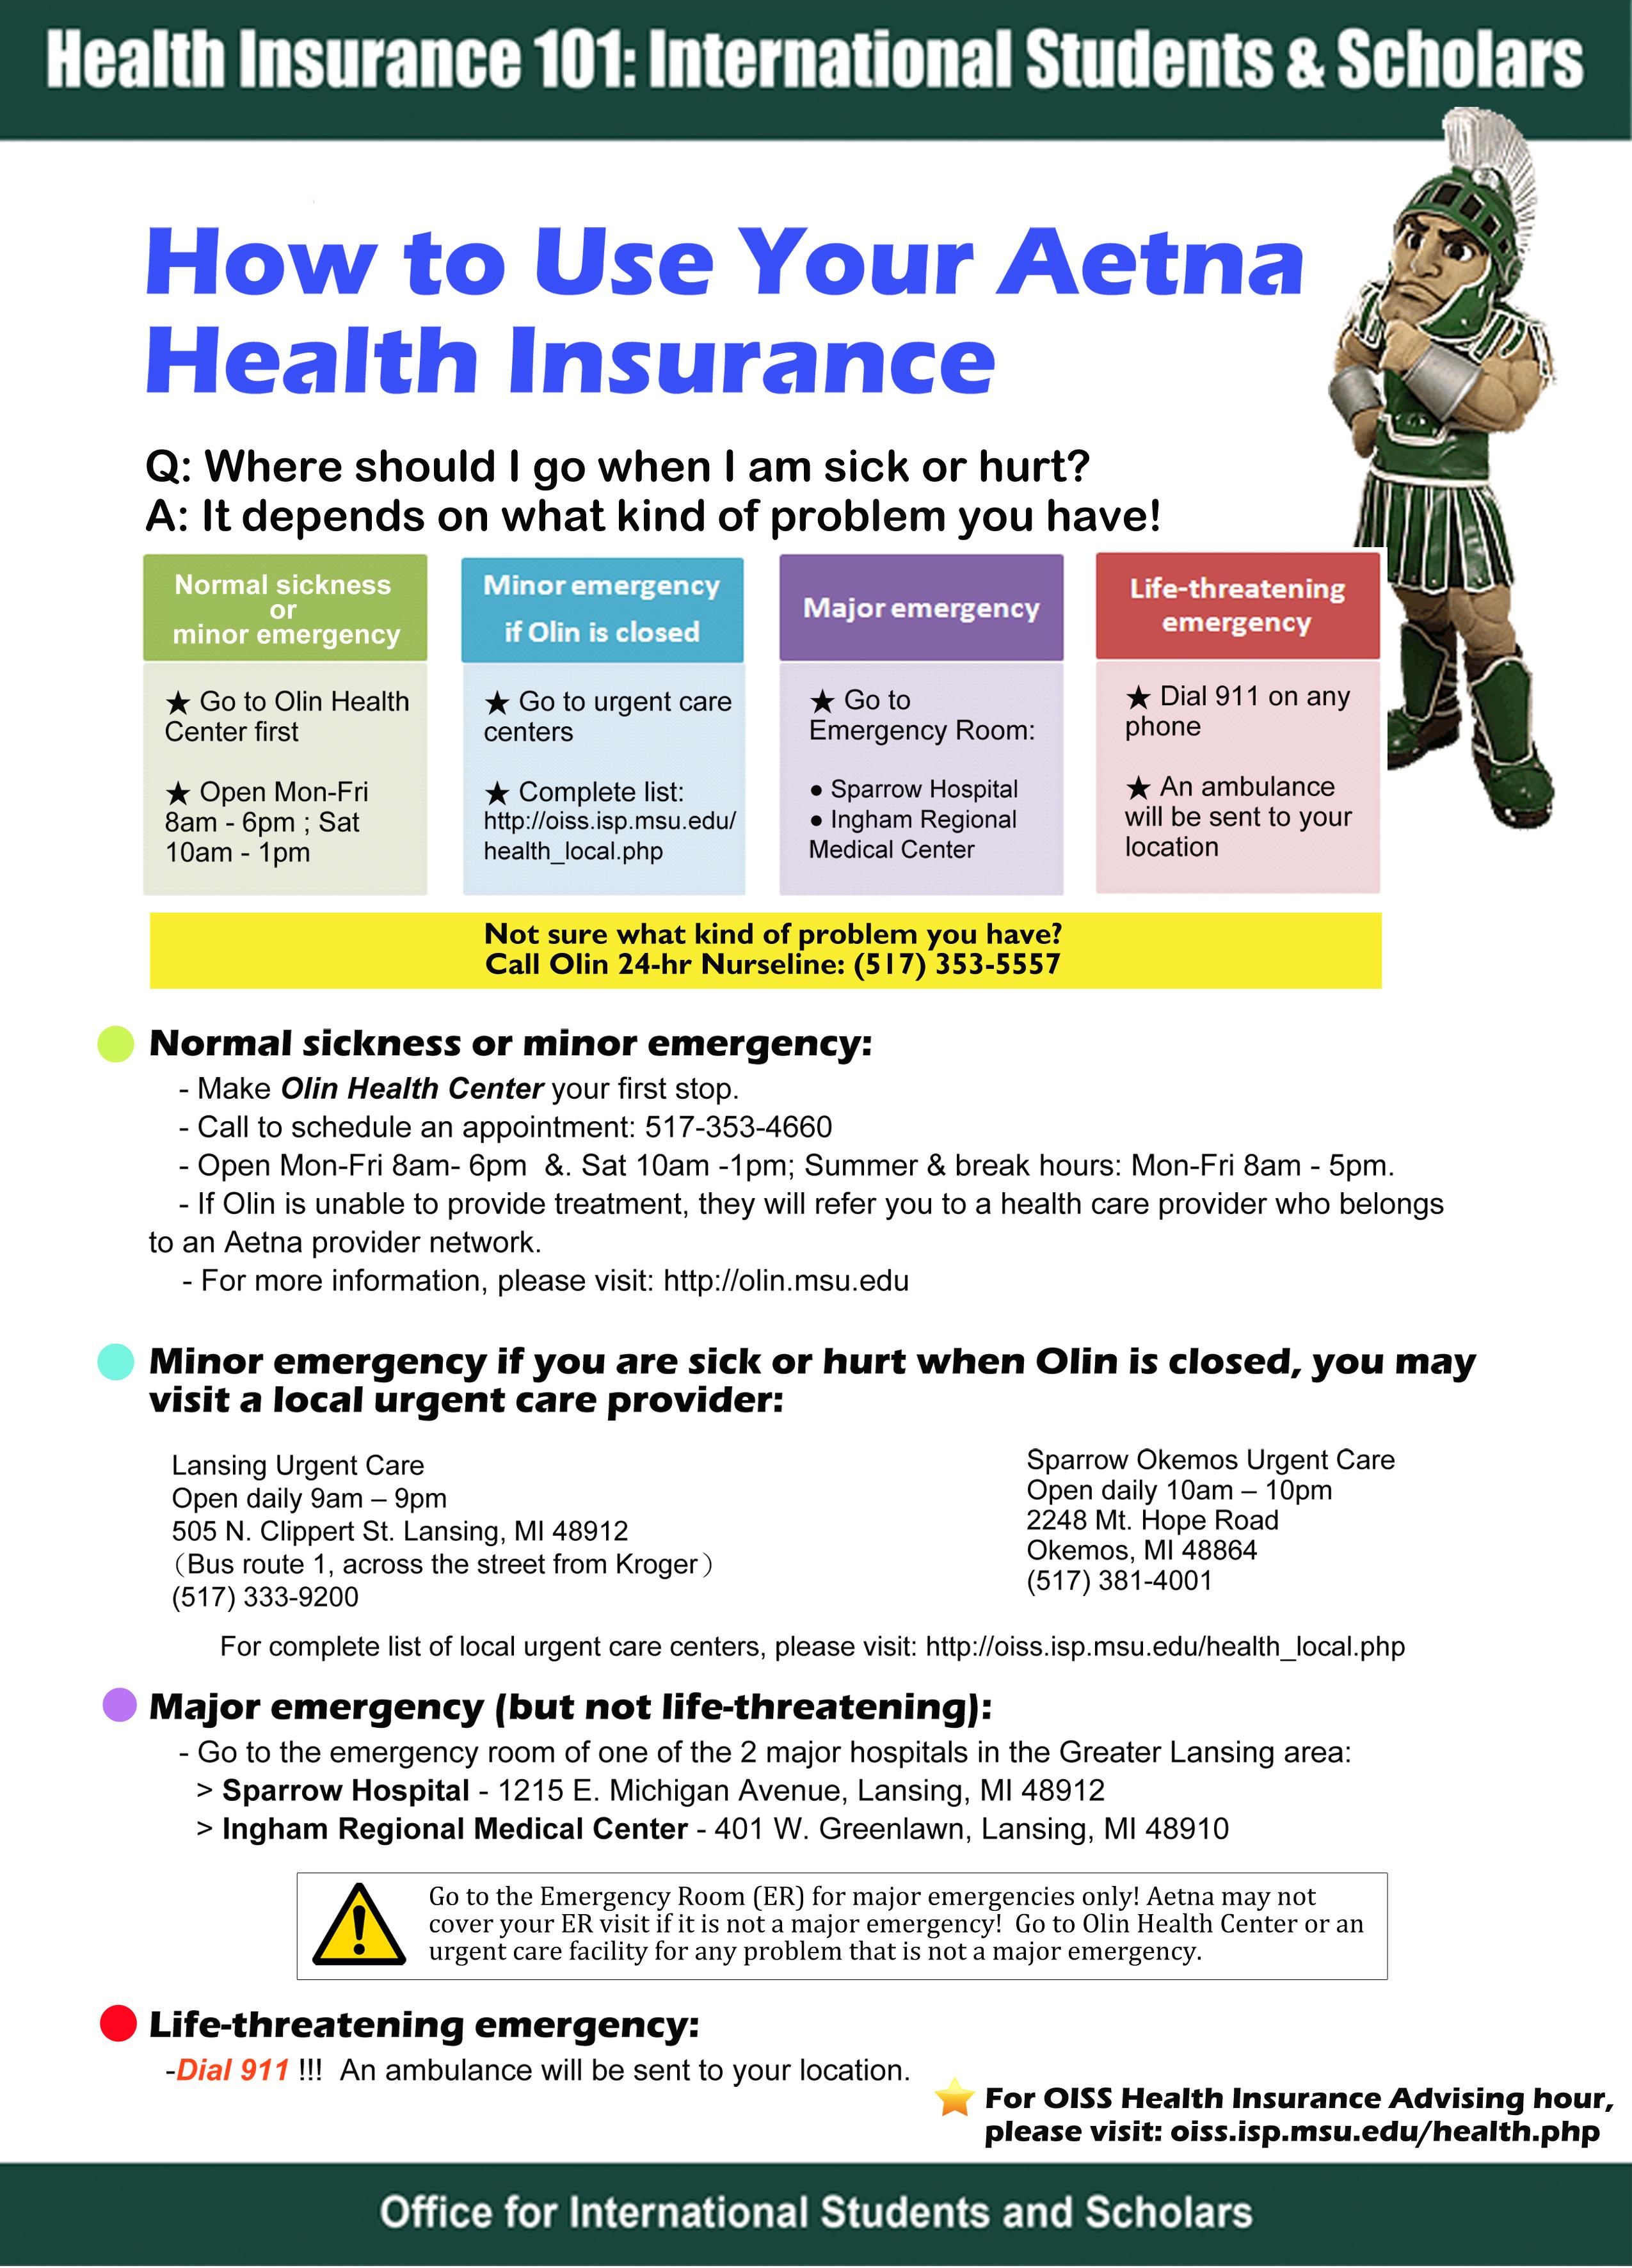 Aetna student health insurance card - insurance